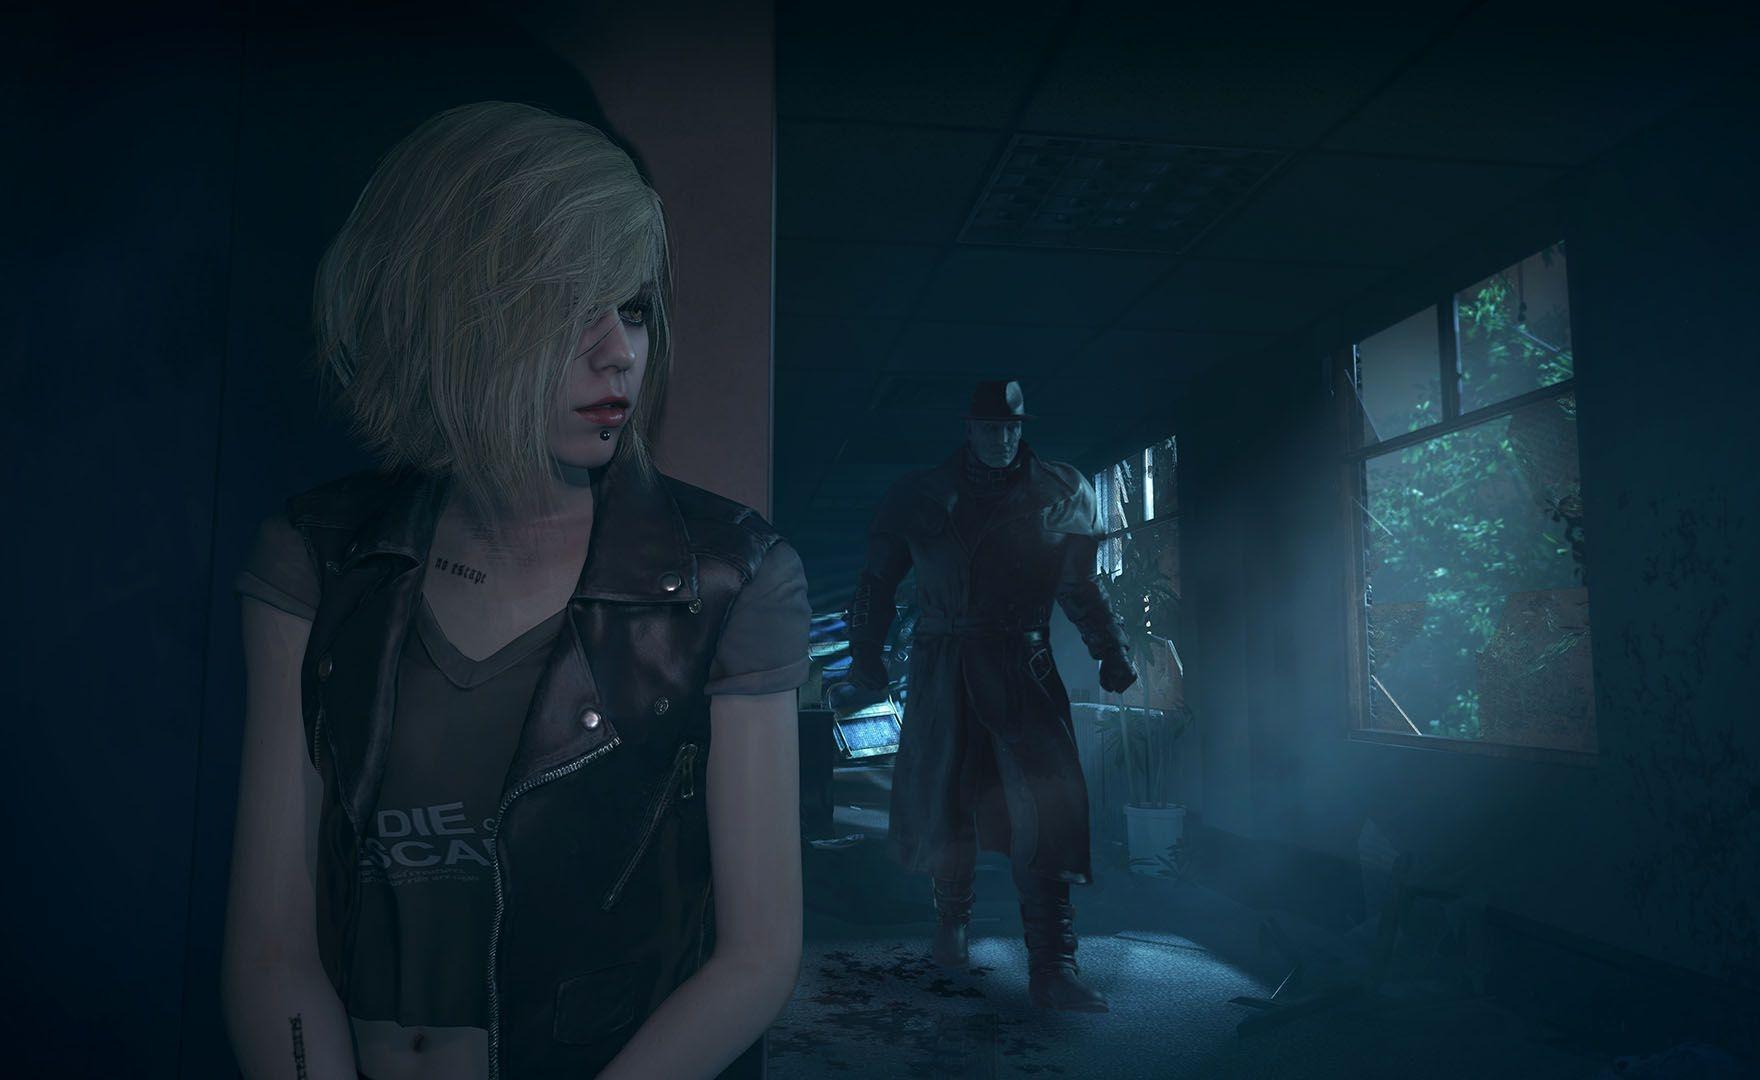 Resident Evil Project Resistance avrà una modalità single player